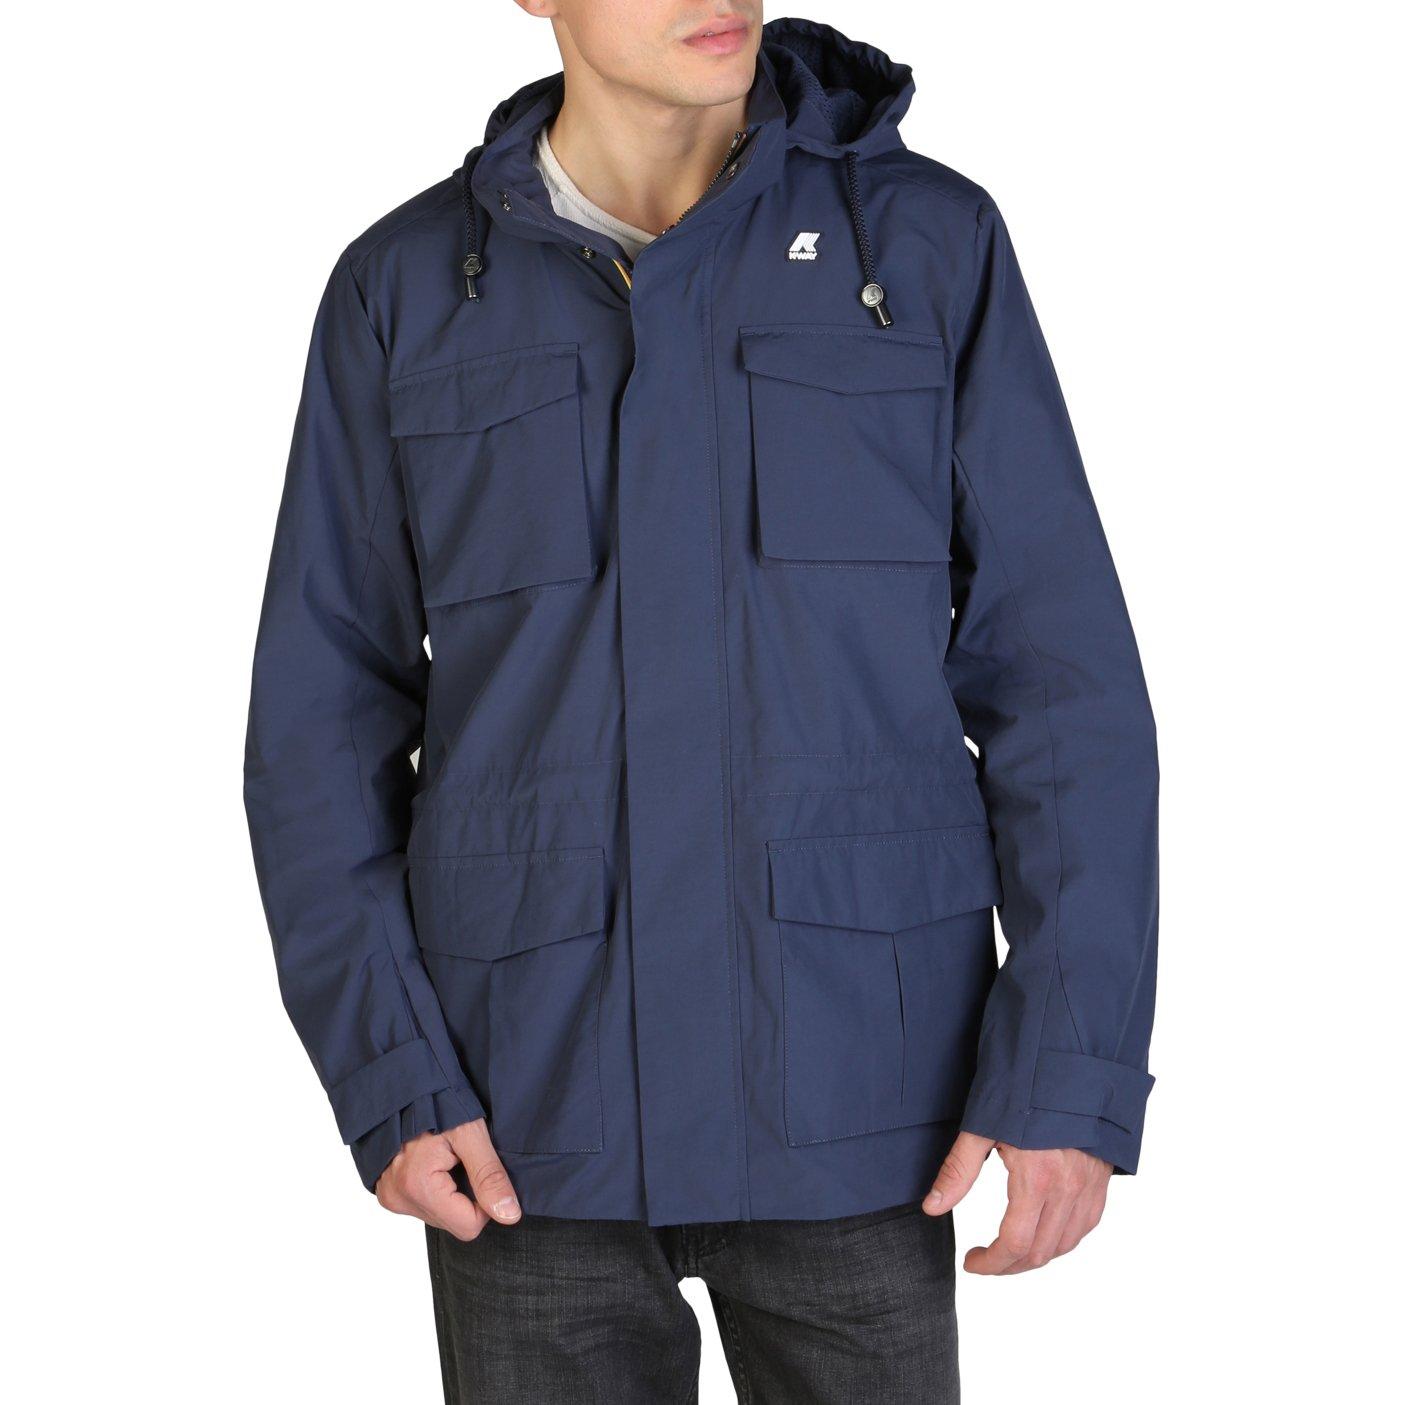 K-Way Men's Jacket Various Colours K00B9J0 - blue M